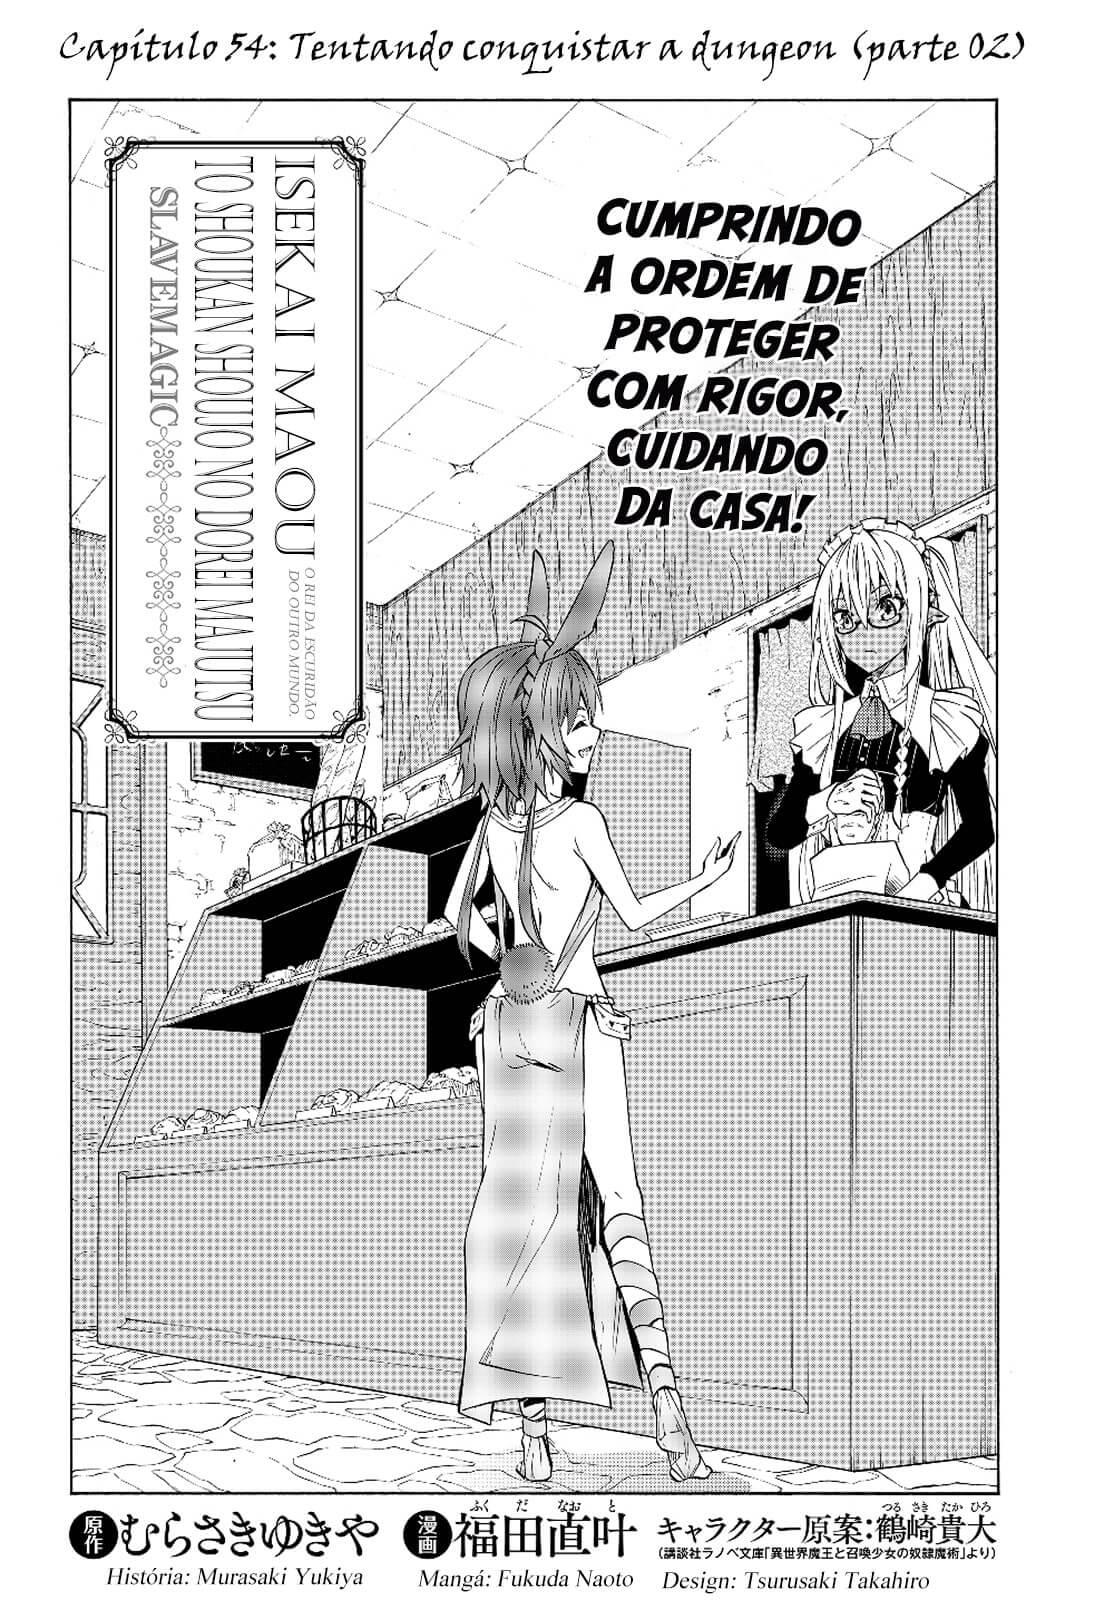 Isekai Maou to Shoukan Shoujo no Dorei Majutsu / How NOT To Summon a Demon Lord Mangá Online Capítulo 54 em Português